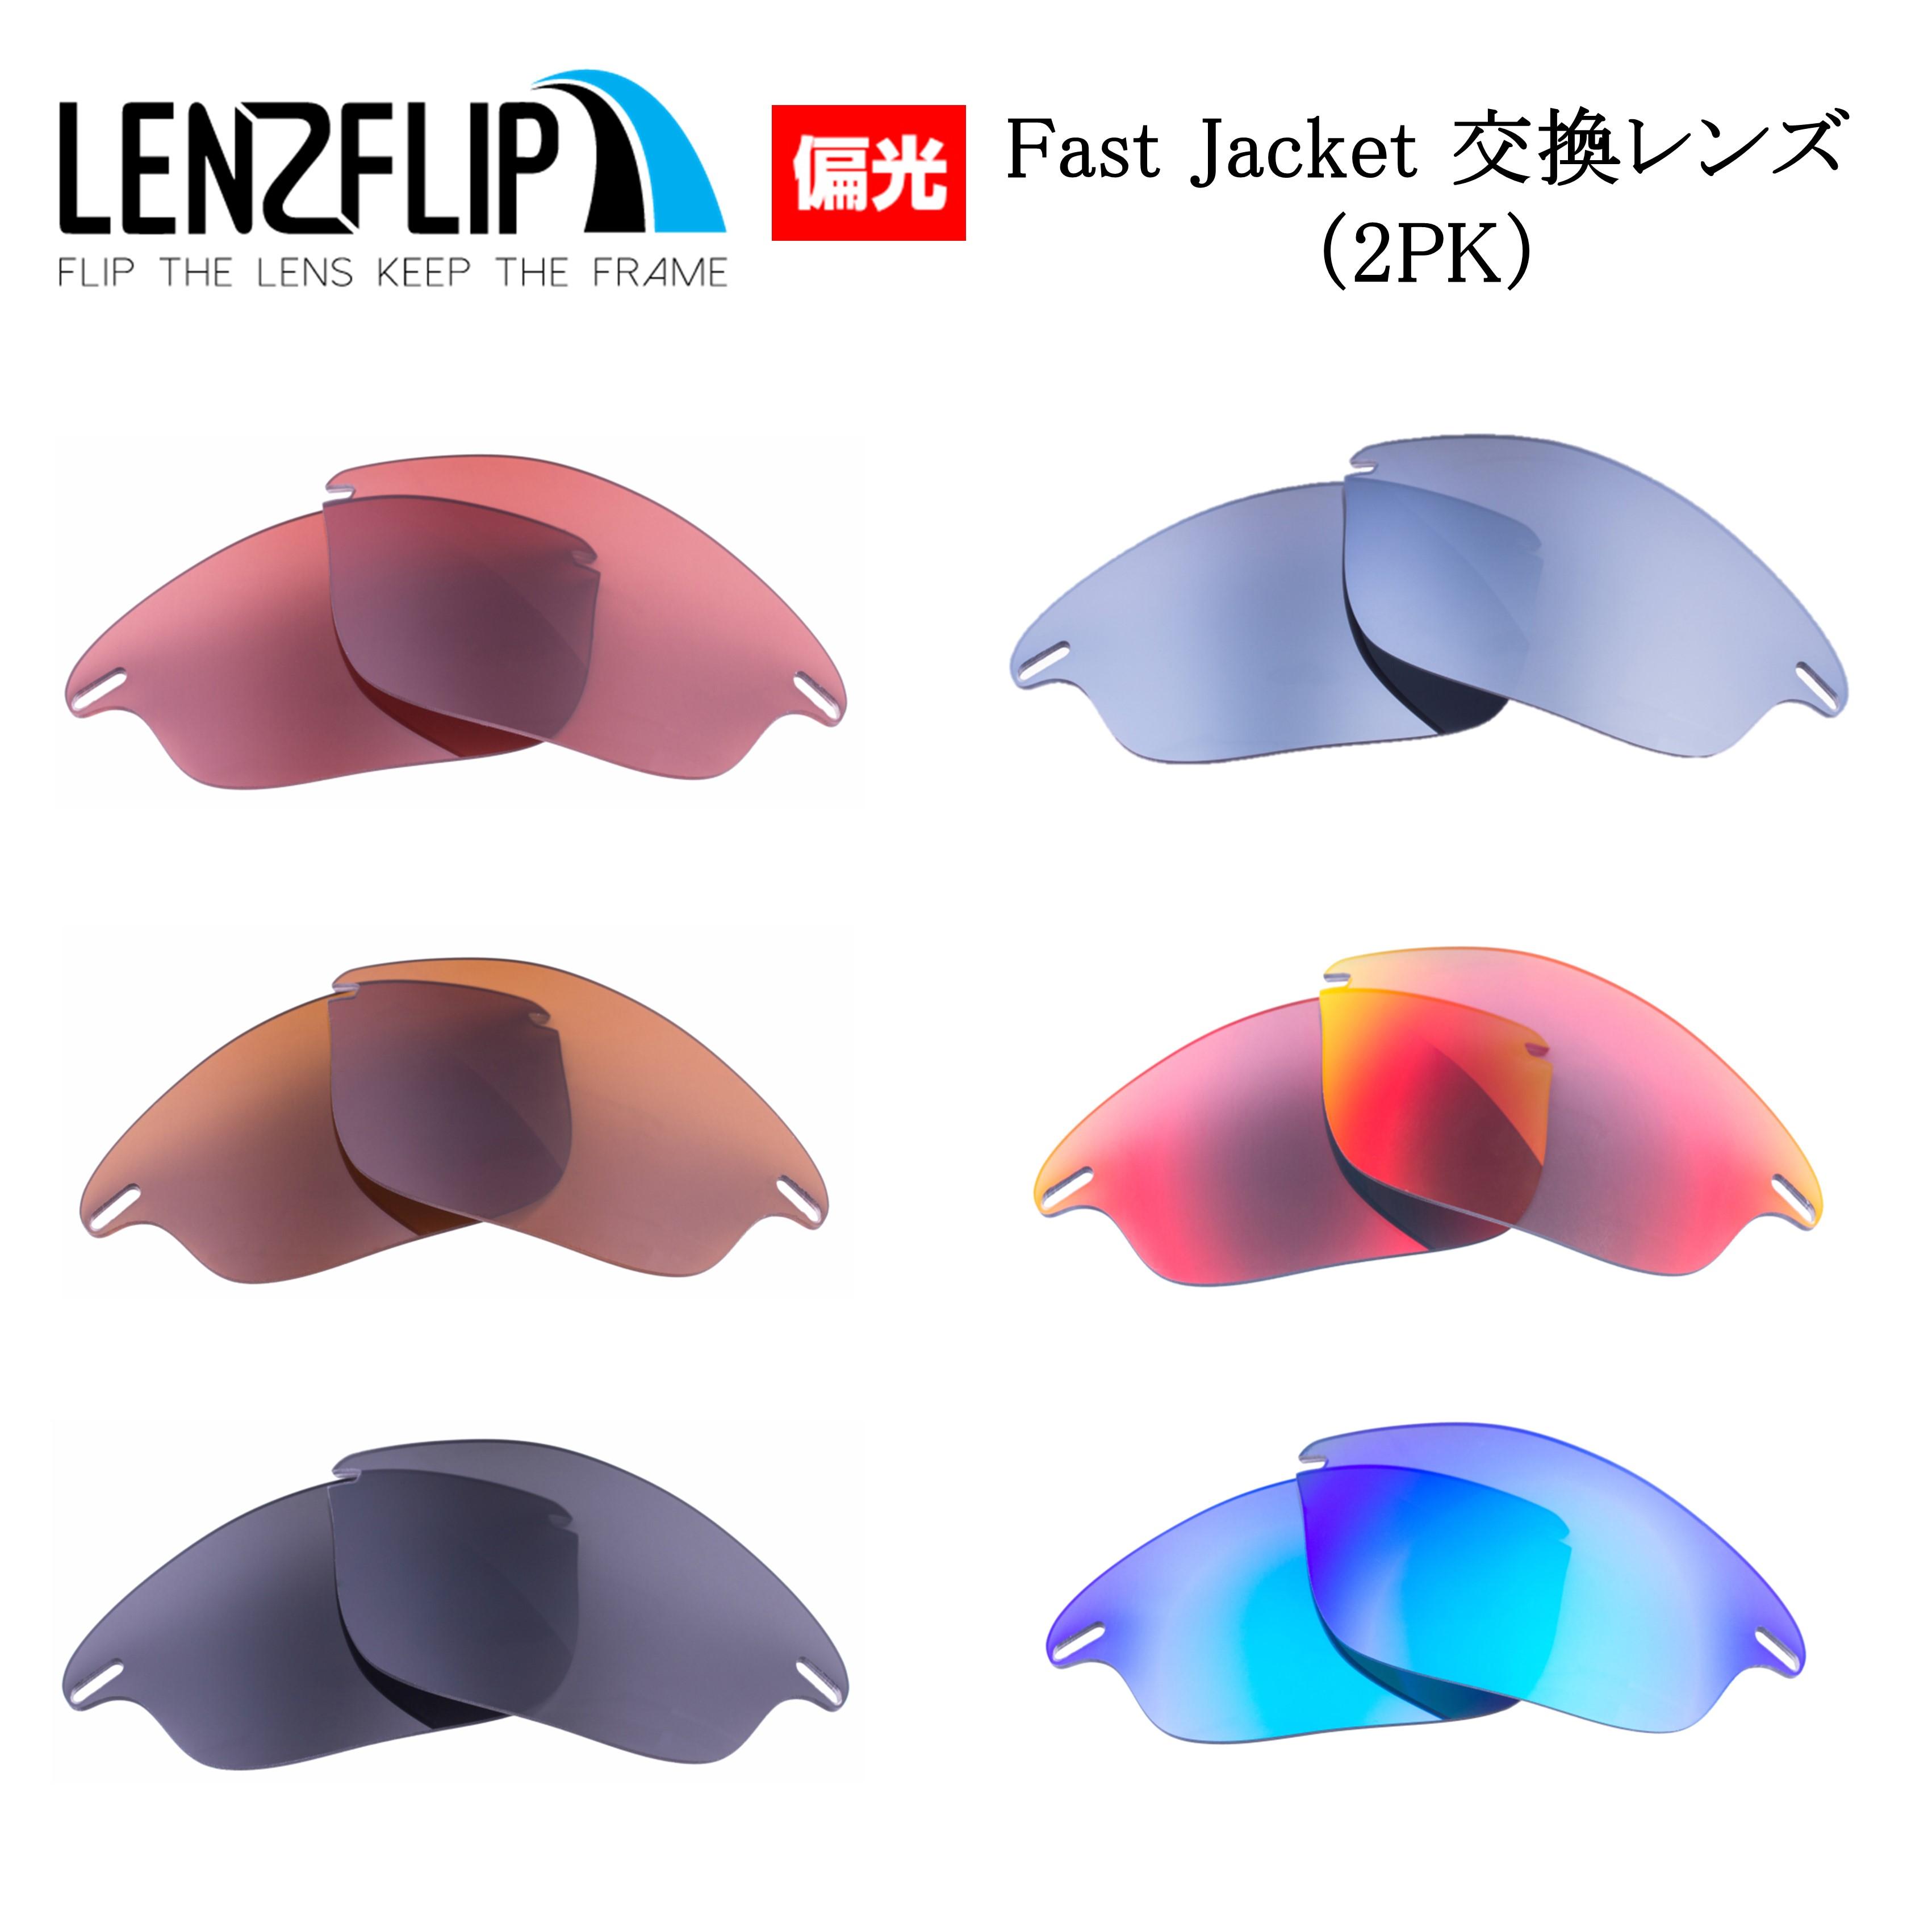 "LENZFLIPからお得な""2色組""が新登場 Oakley Fast Jacket にジャストフィット サングラス交換用レンズ 偏光レンズを試したことが無いなんてもったいない サングラス交換レンズ ファストジャケット レンズ2色セットオークリー オークリー 代引き不可 偏光レンズ 時間指定不可"